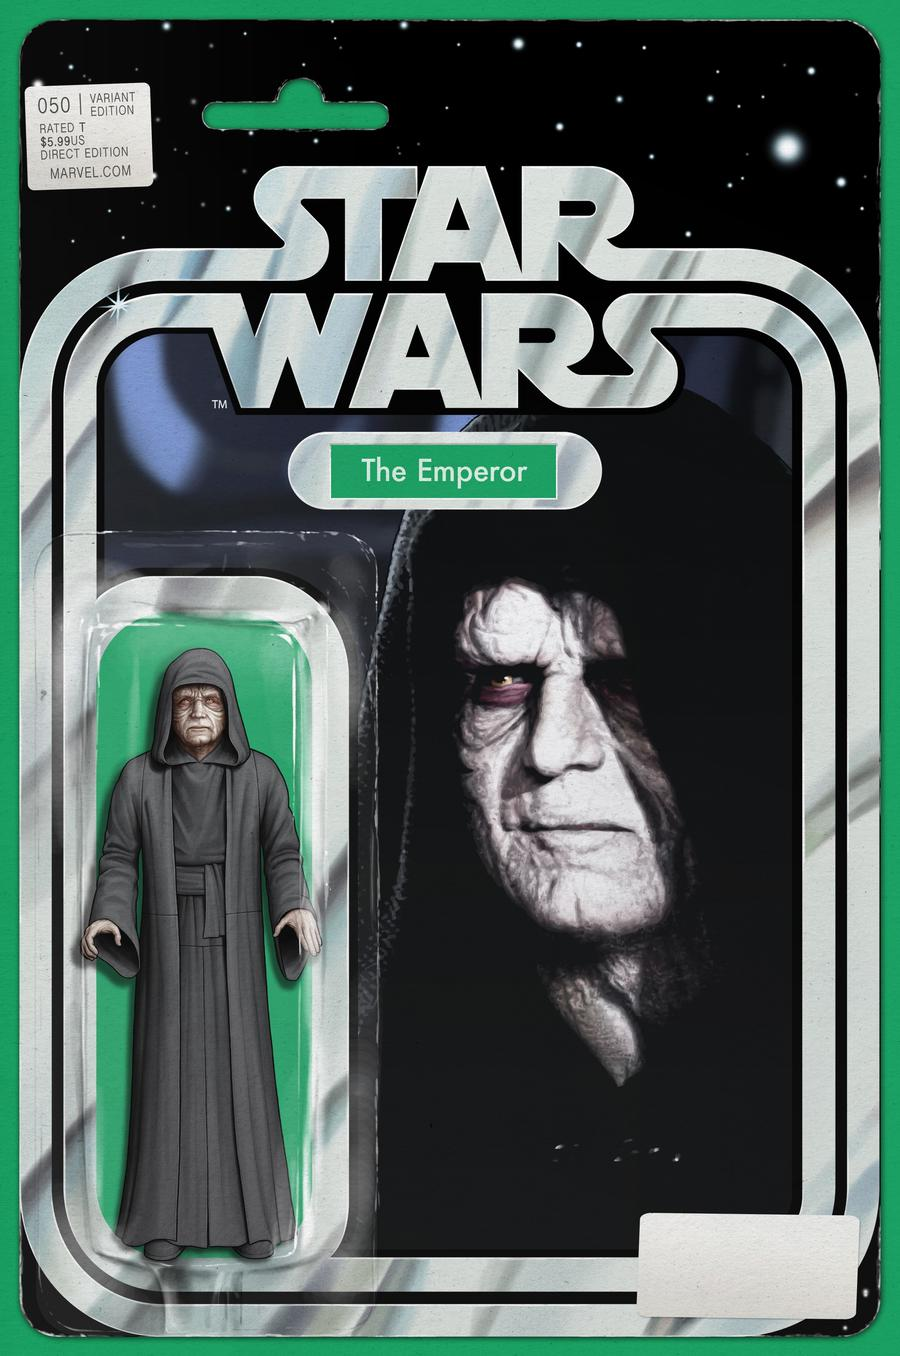 Star Wars Vol 4 #50 Cover C Variant John Tyler Christopher Action Figure Cover